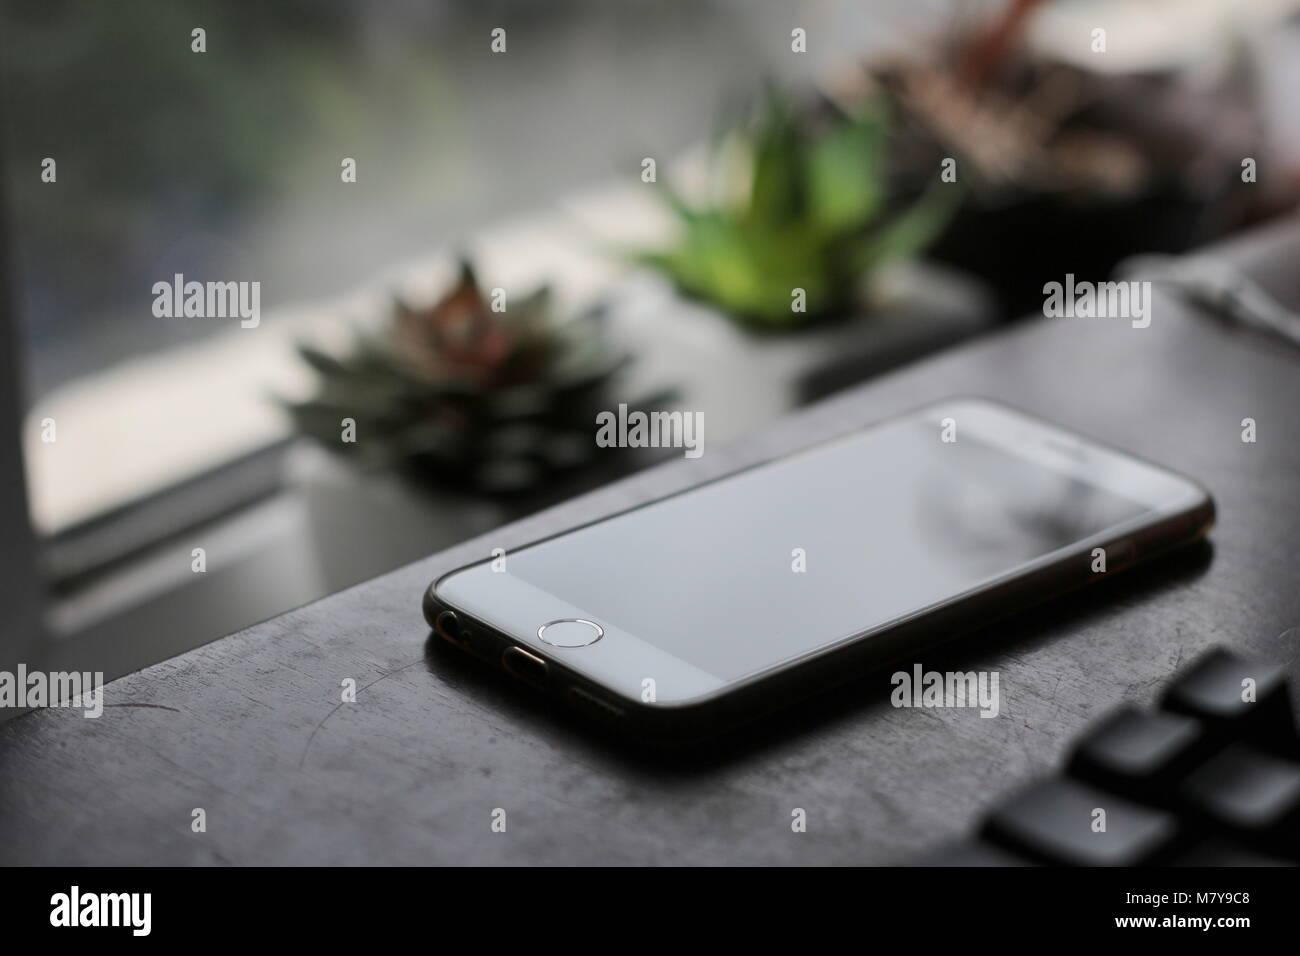 phone on desk - Stock Image